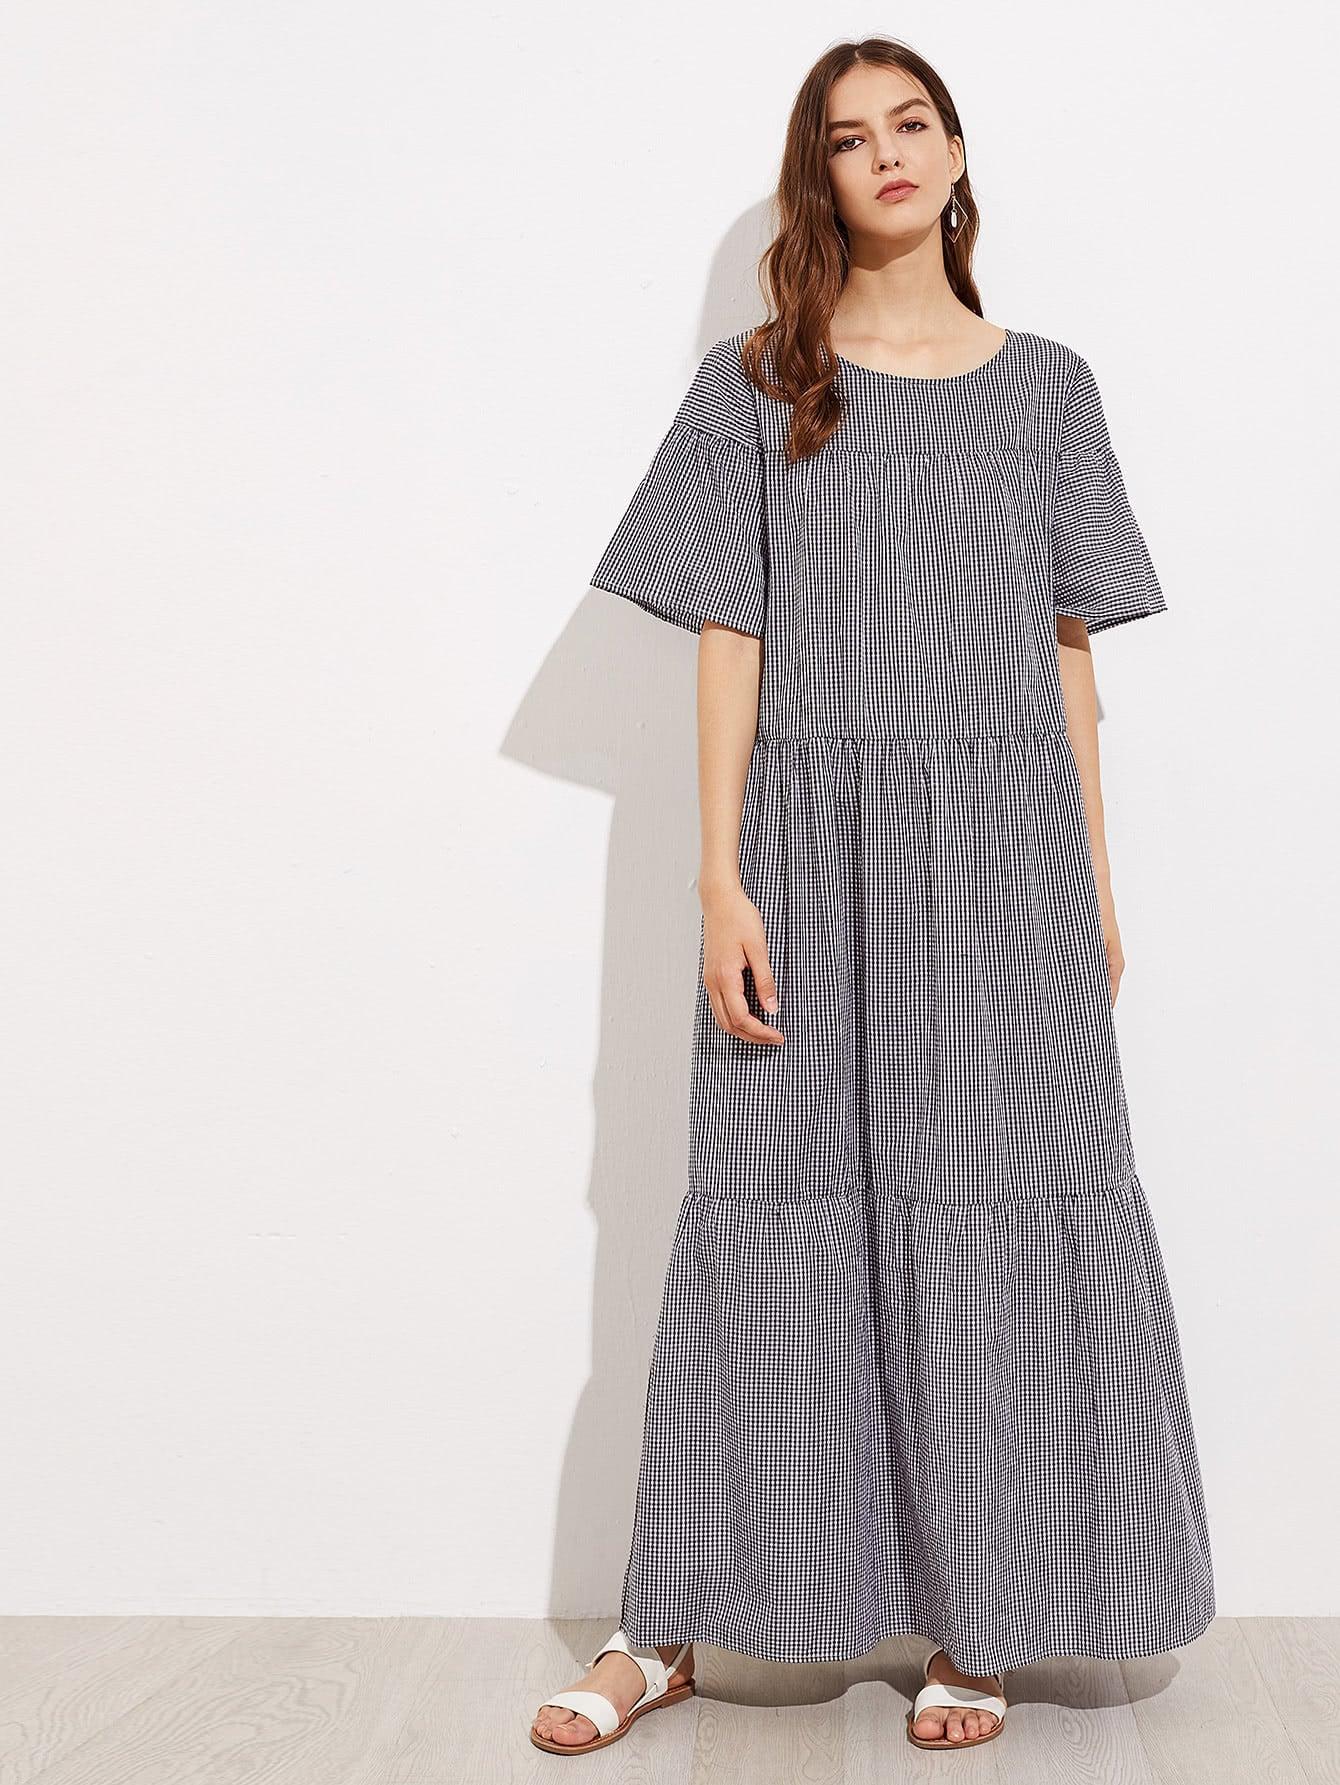 Gingham Full Length Tiered Dress